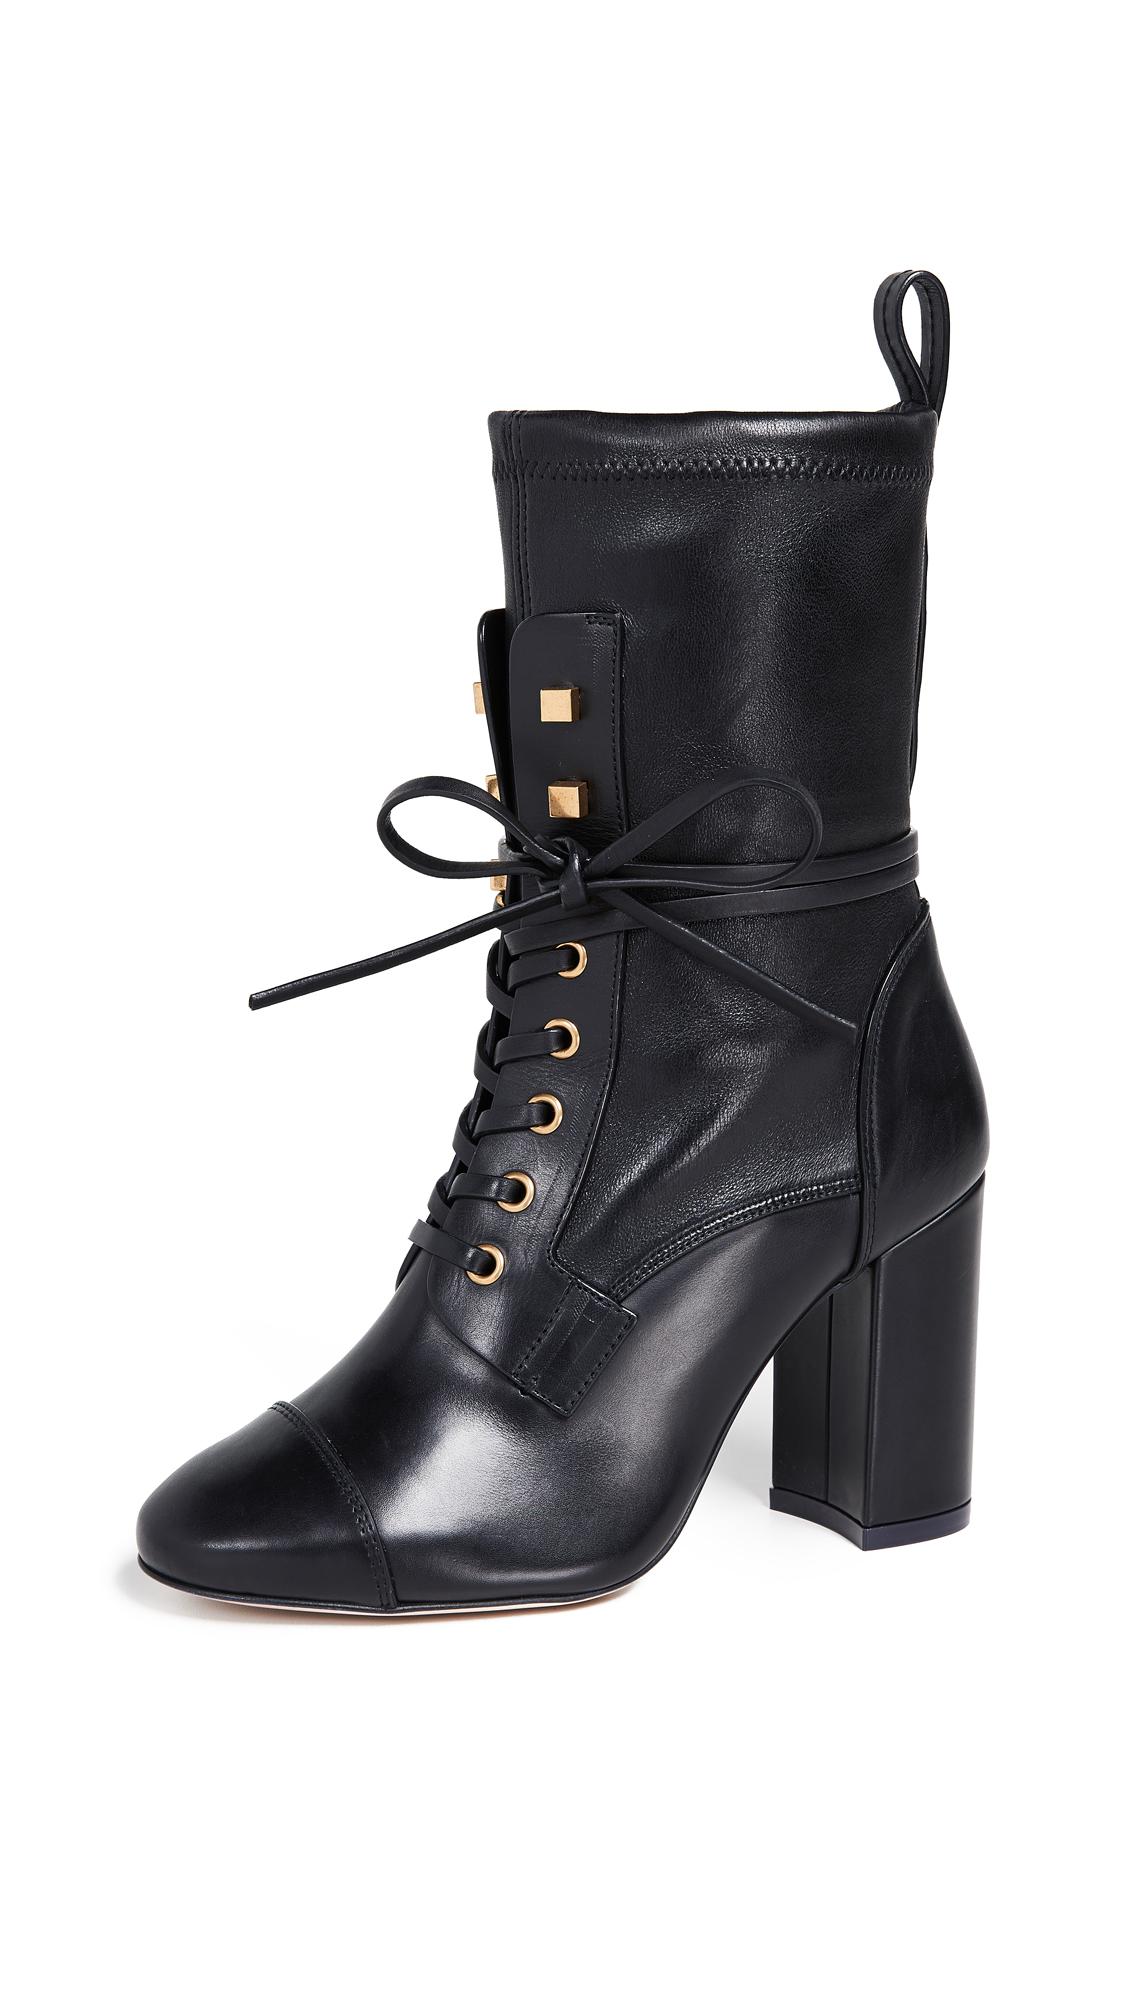 Stuart Weitzman Veruka Boots - Black